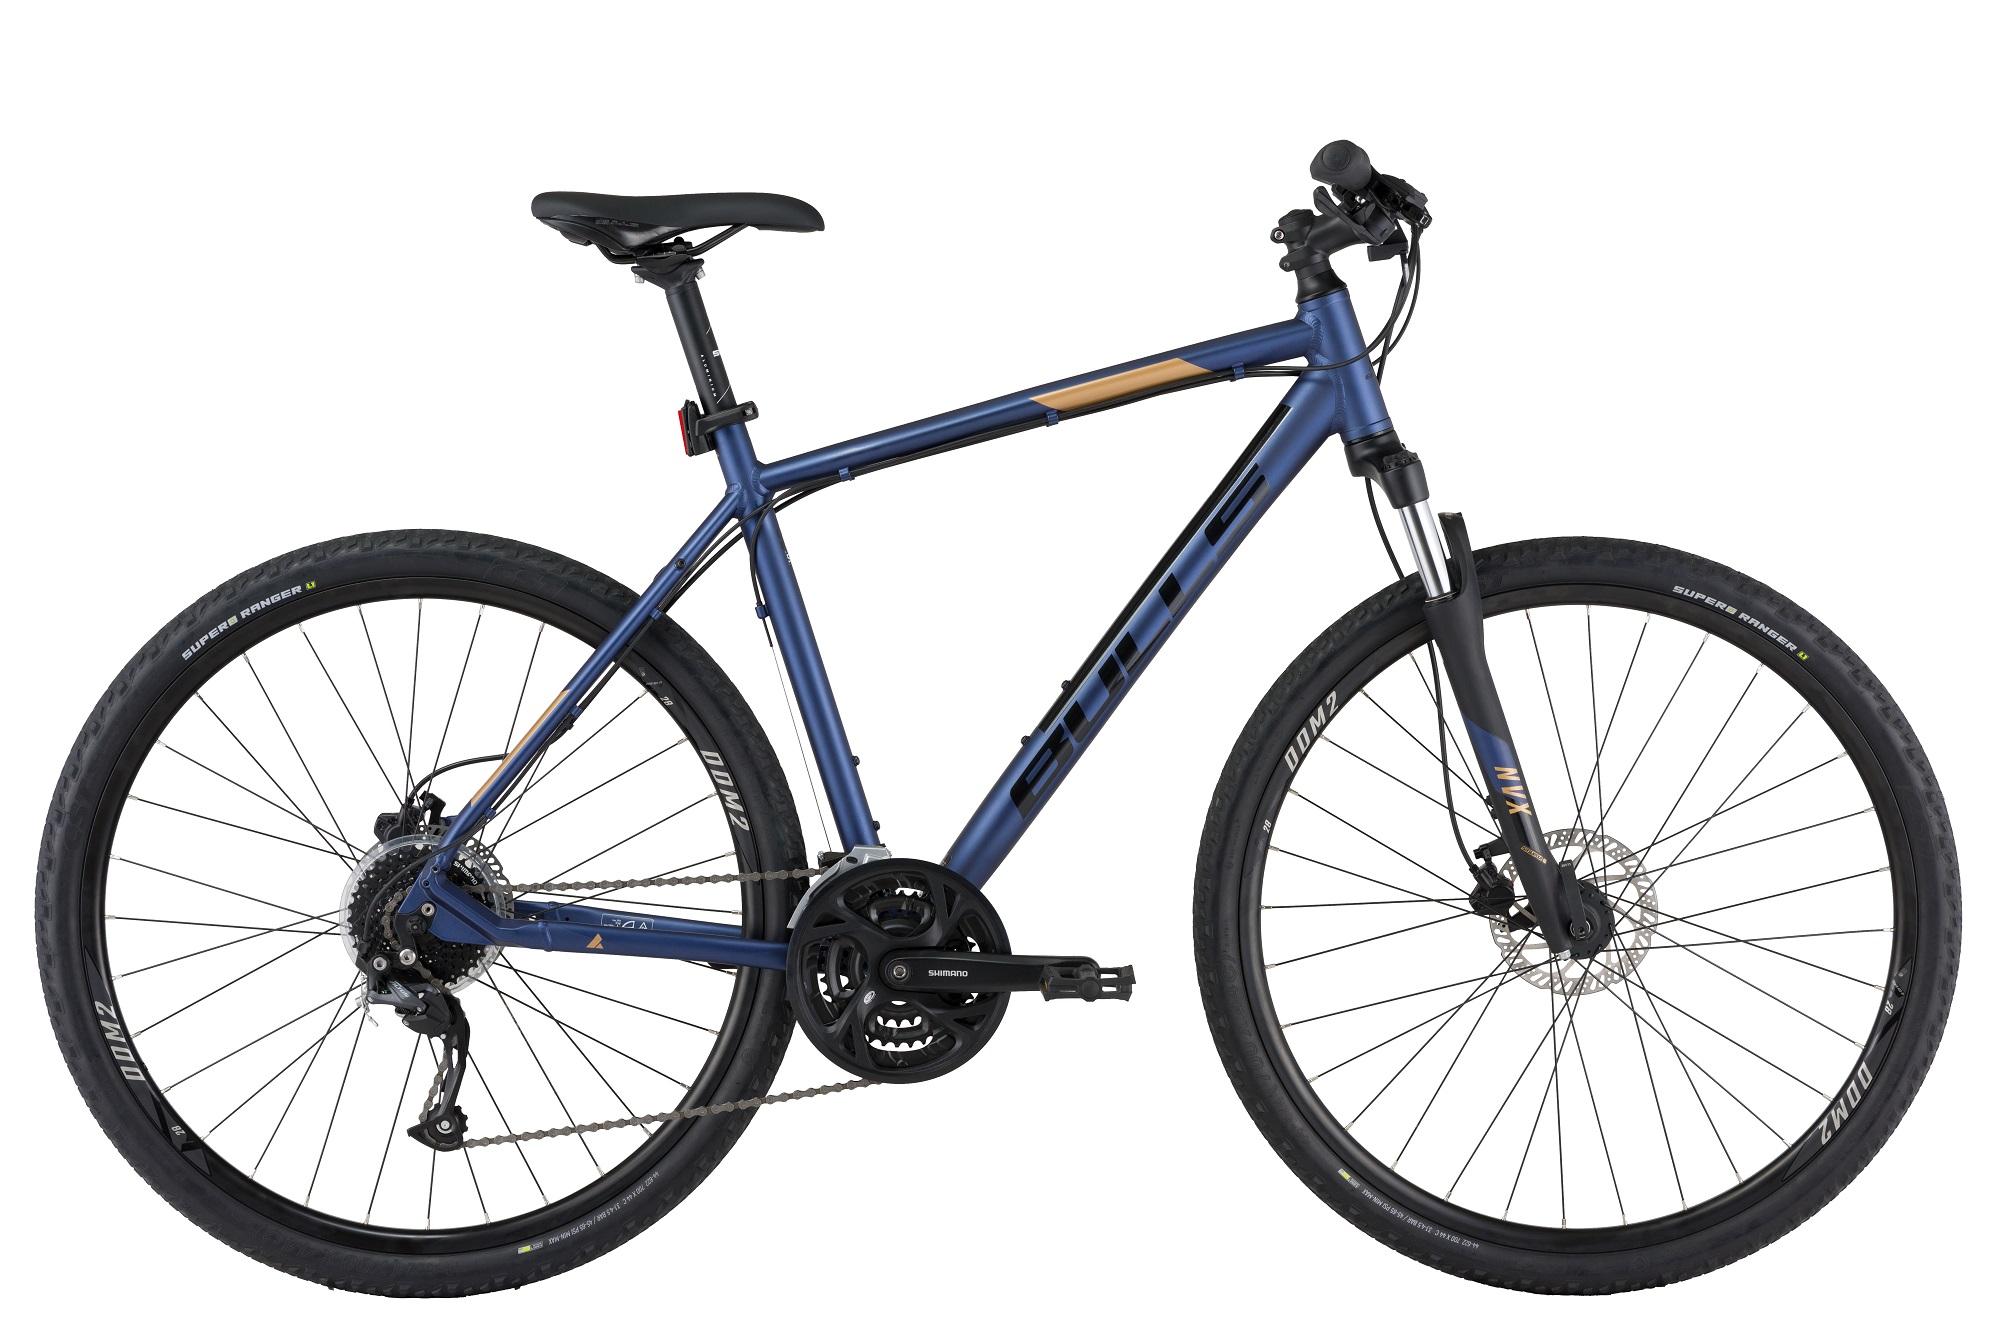 BULLS Crossbike 2